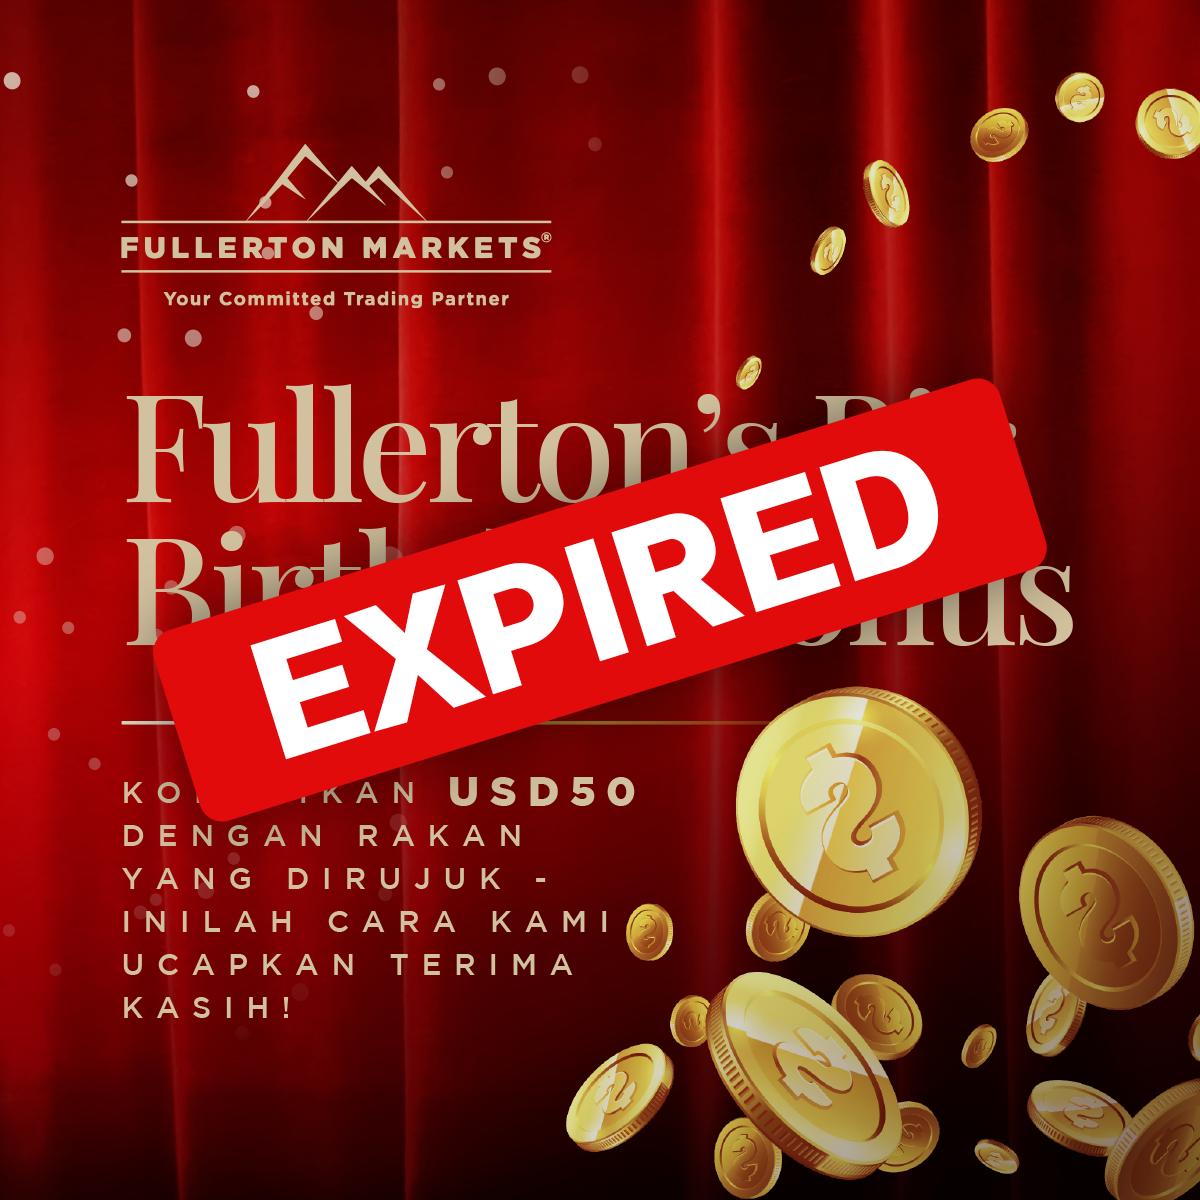 Fullerton_s-Big-Birthday-Payout_1200x1200px-(1)